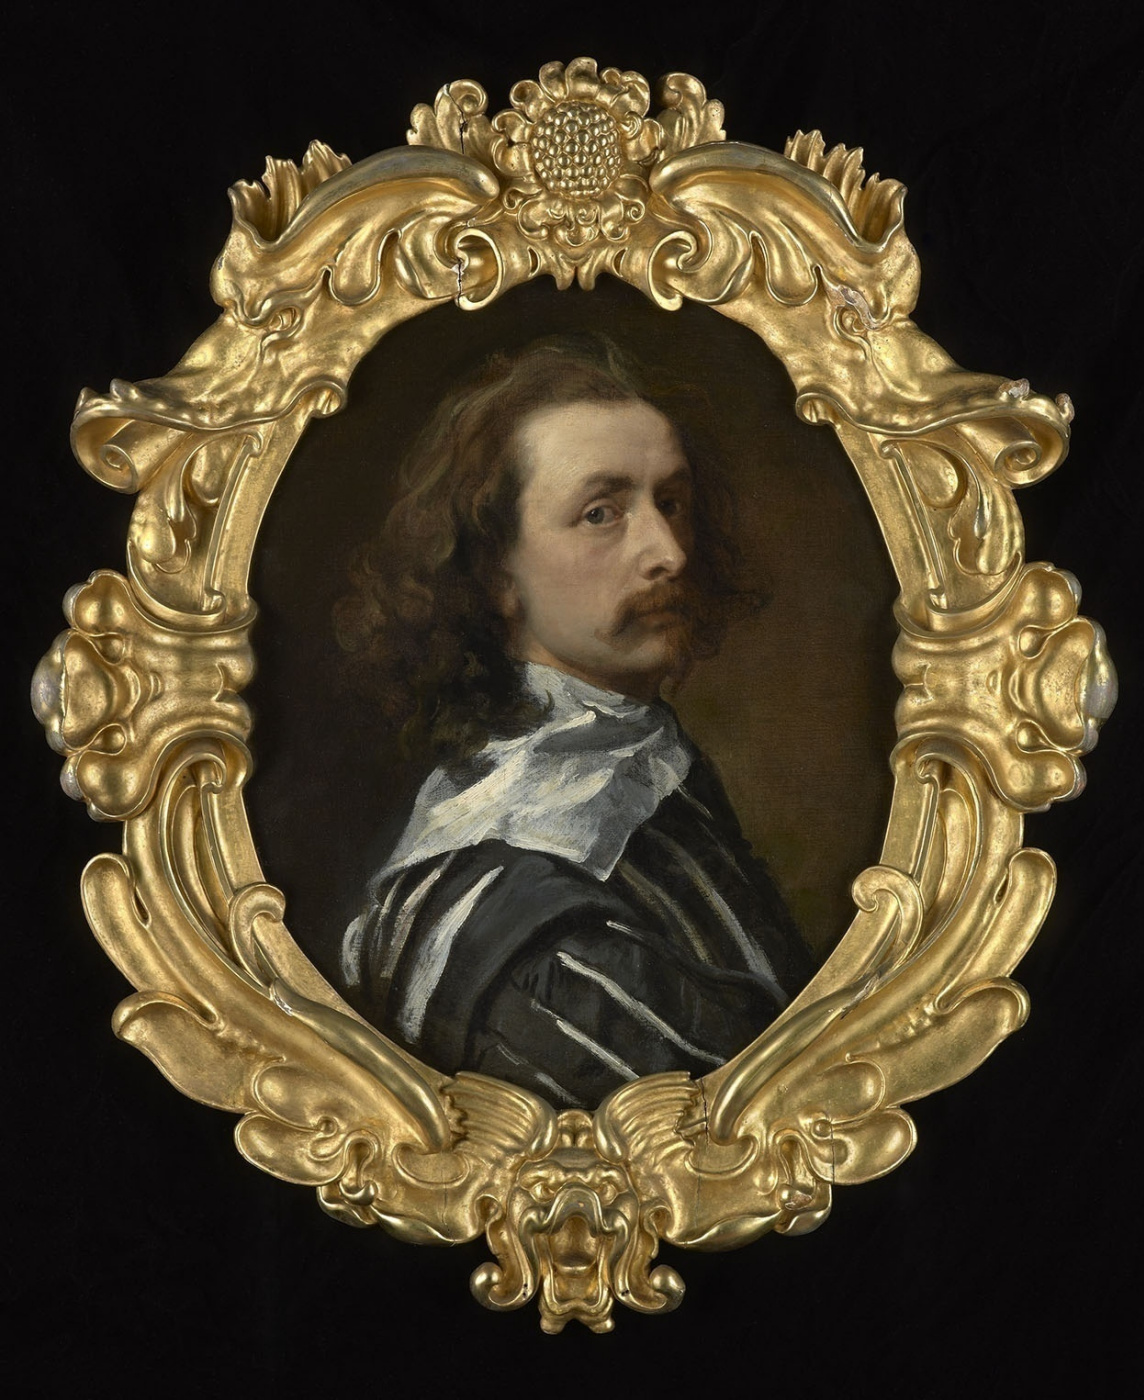 Как англичане ван Дейка спасали: 10 тысяч фунтов для портрета творца!